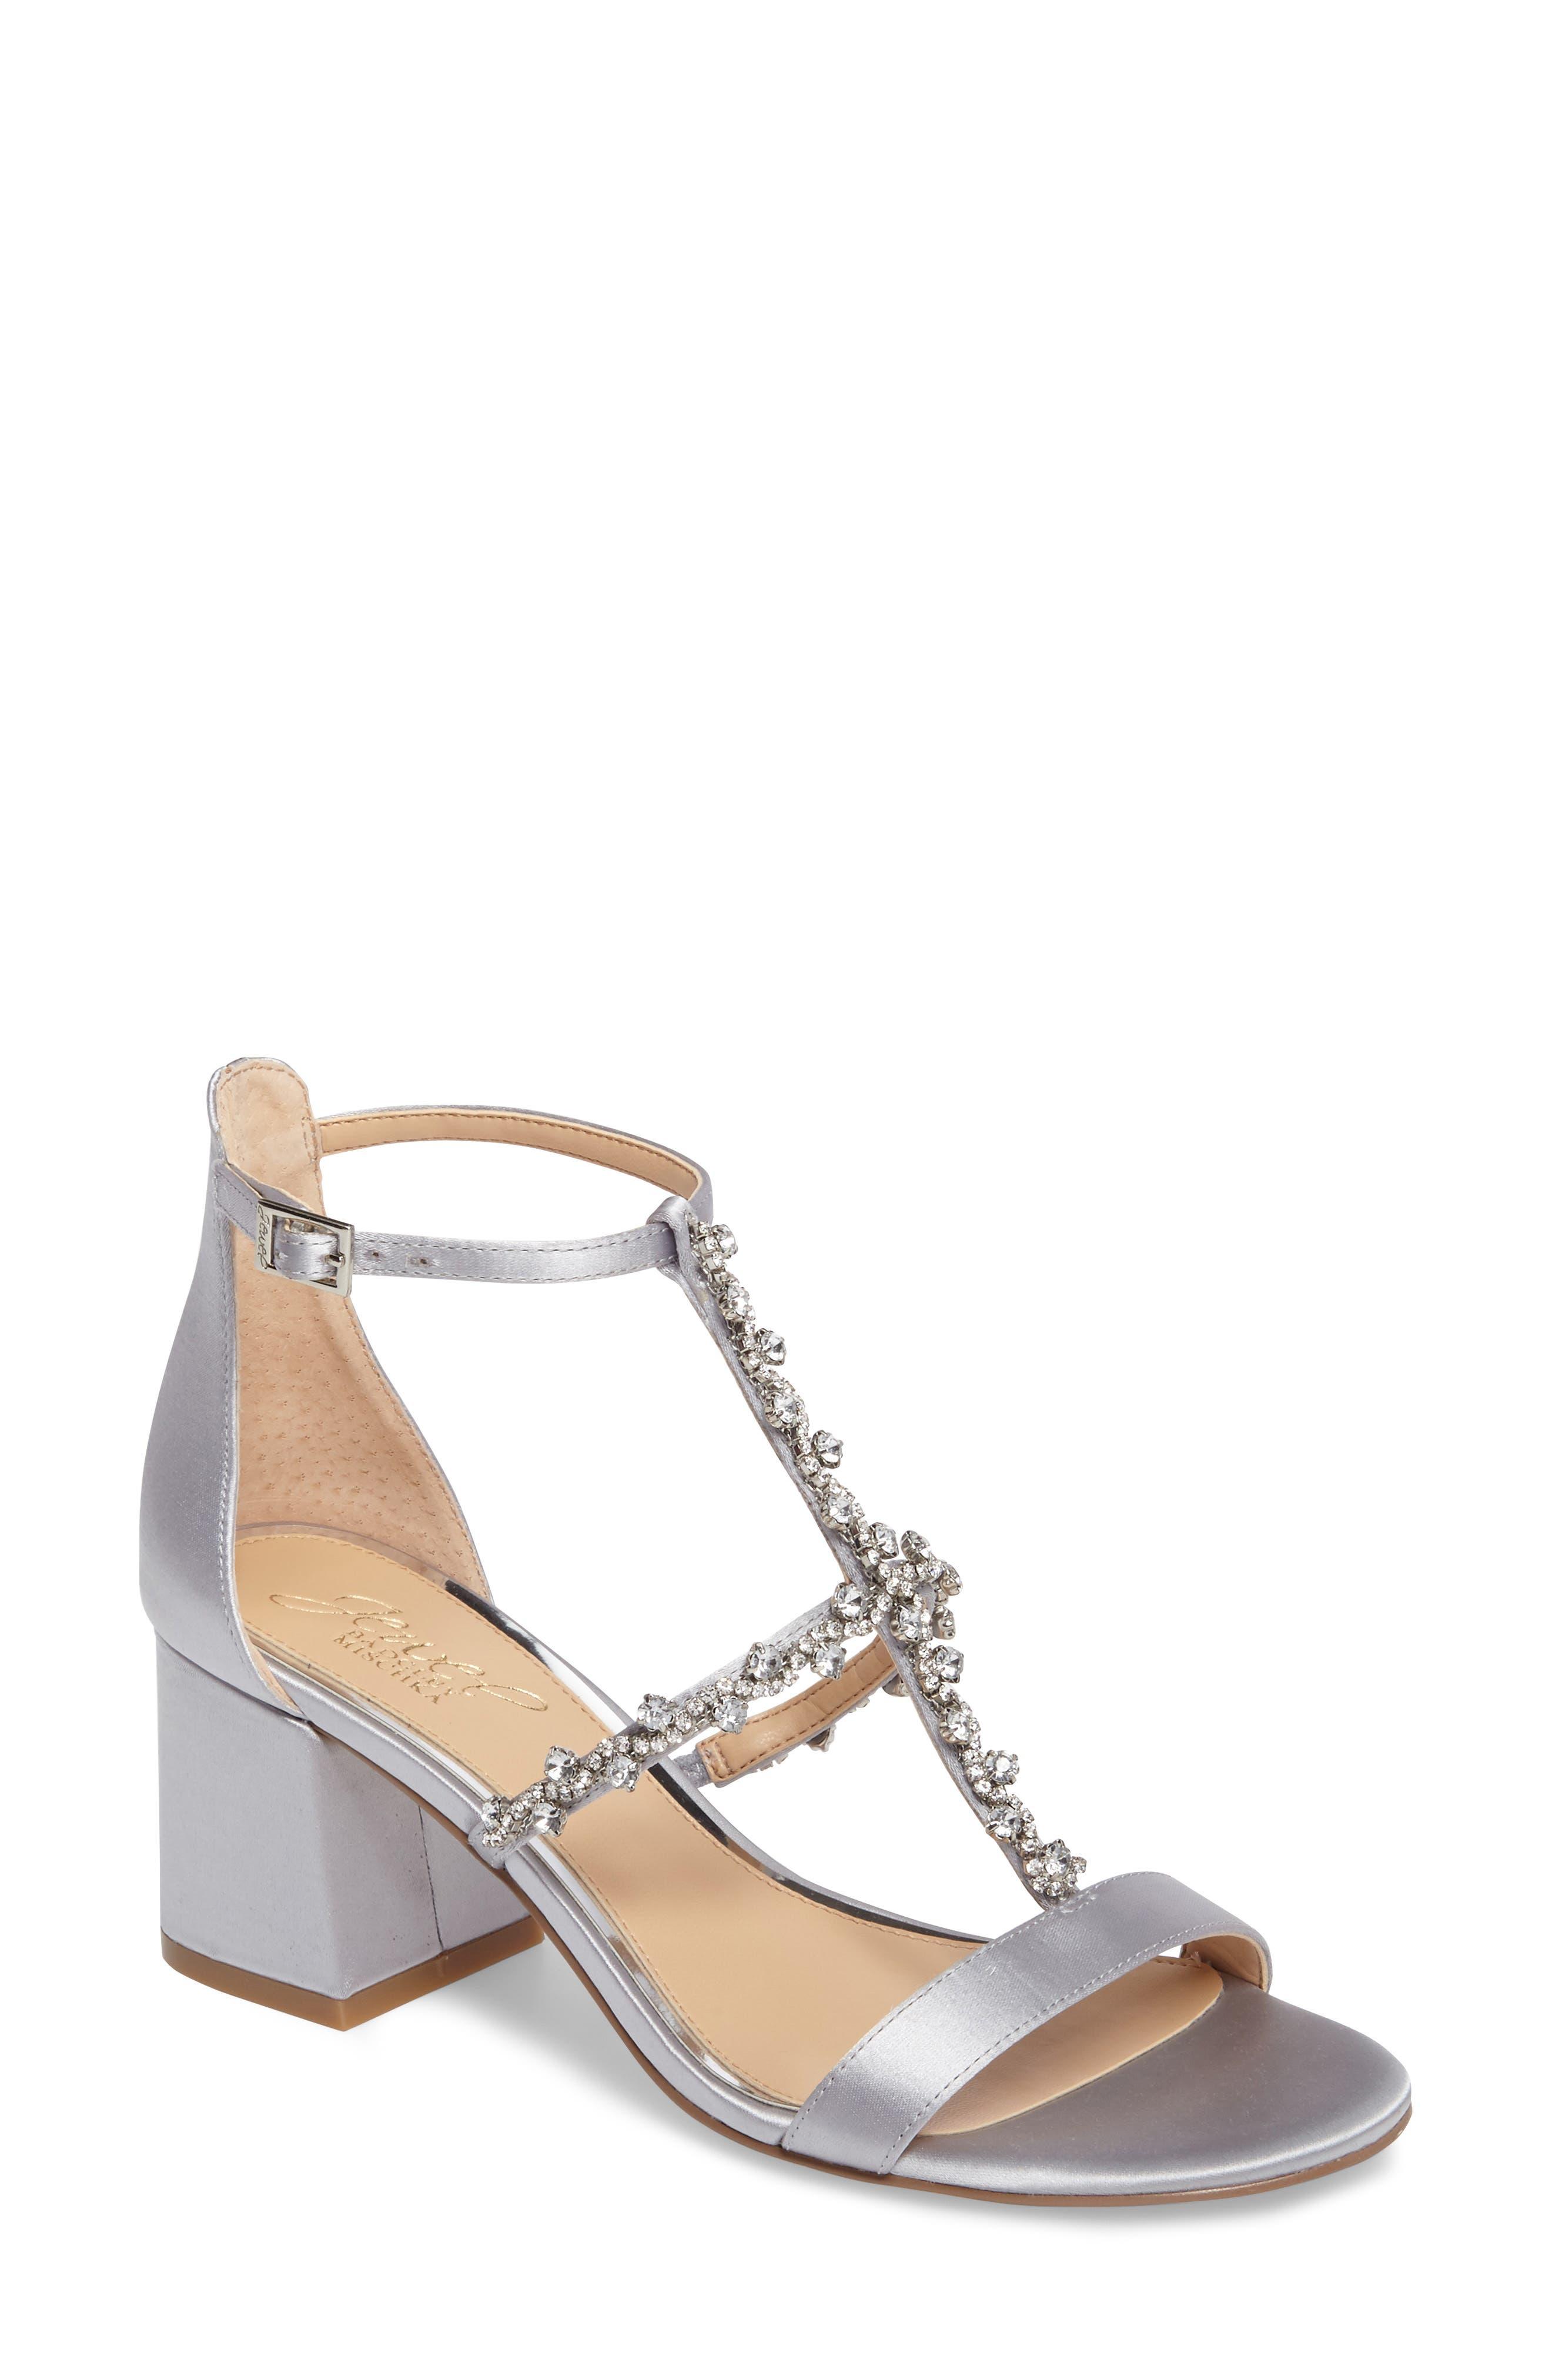 Jewel Badgley Mischka Alamea Block Heel Sandal (Women)